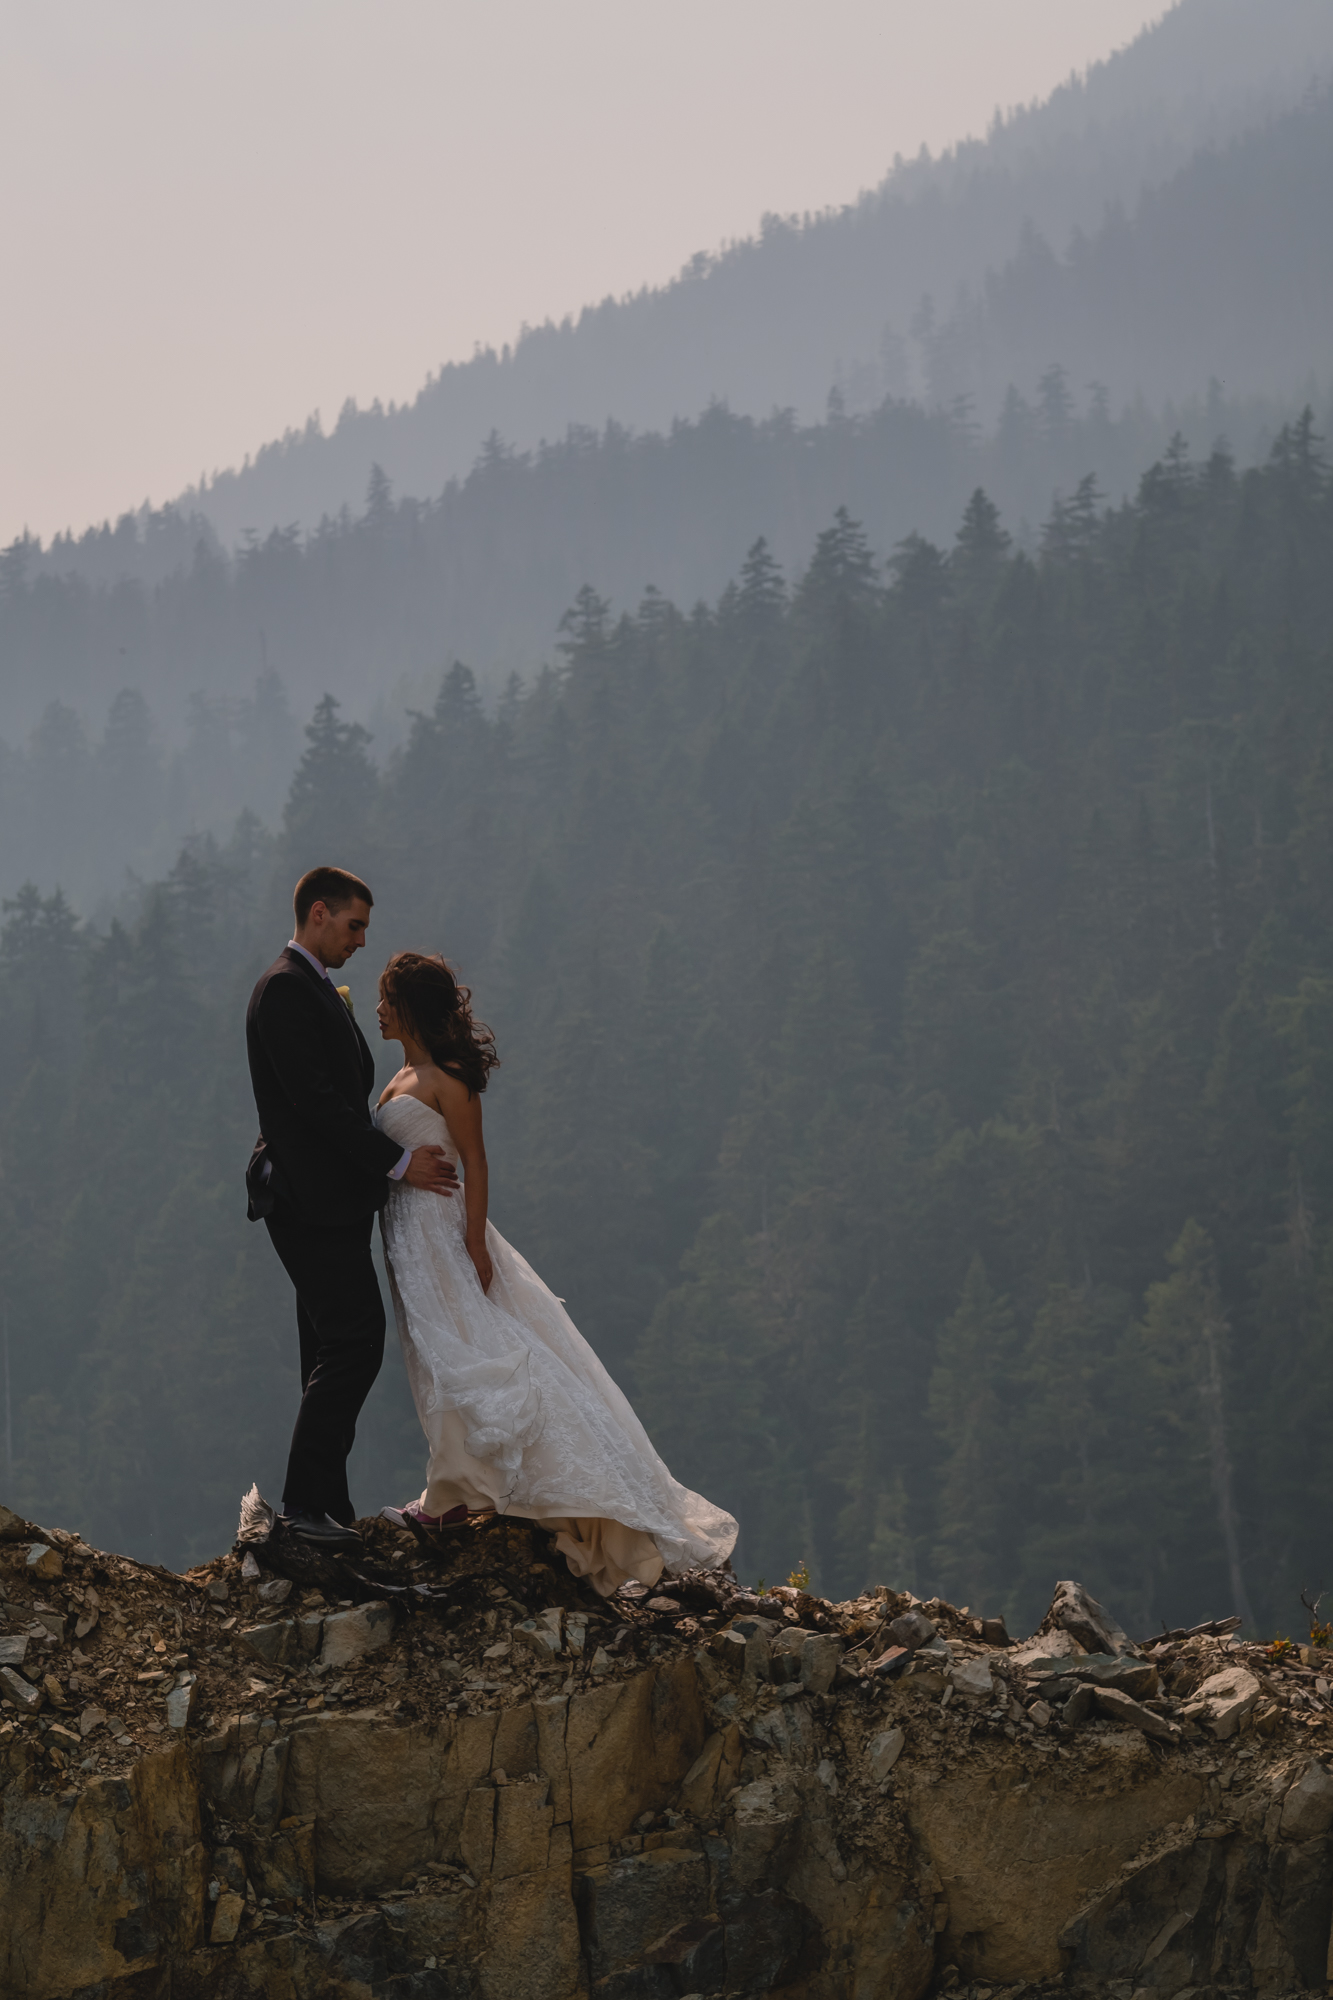 whistler summer evening couple